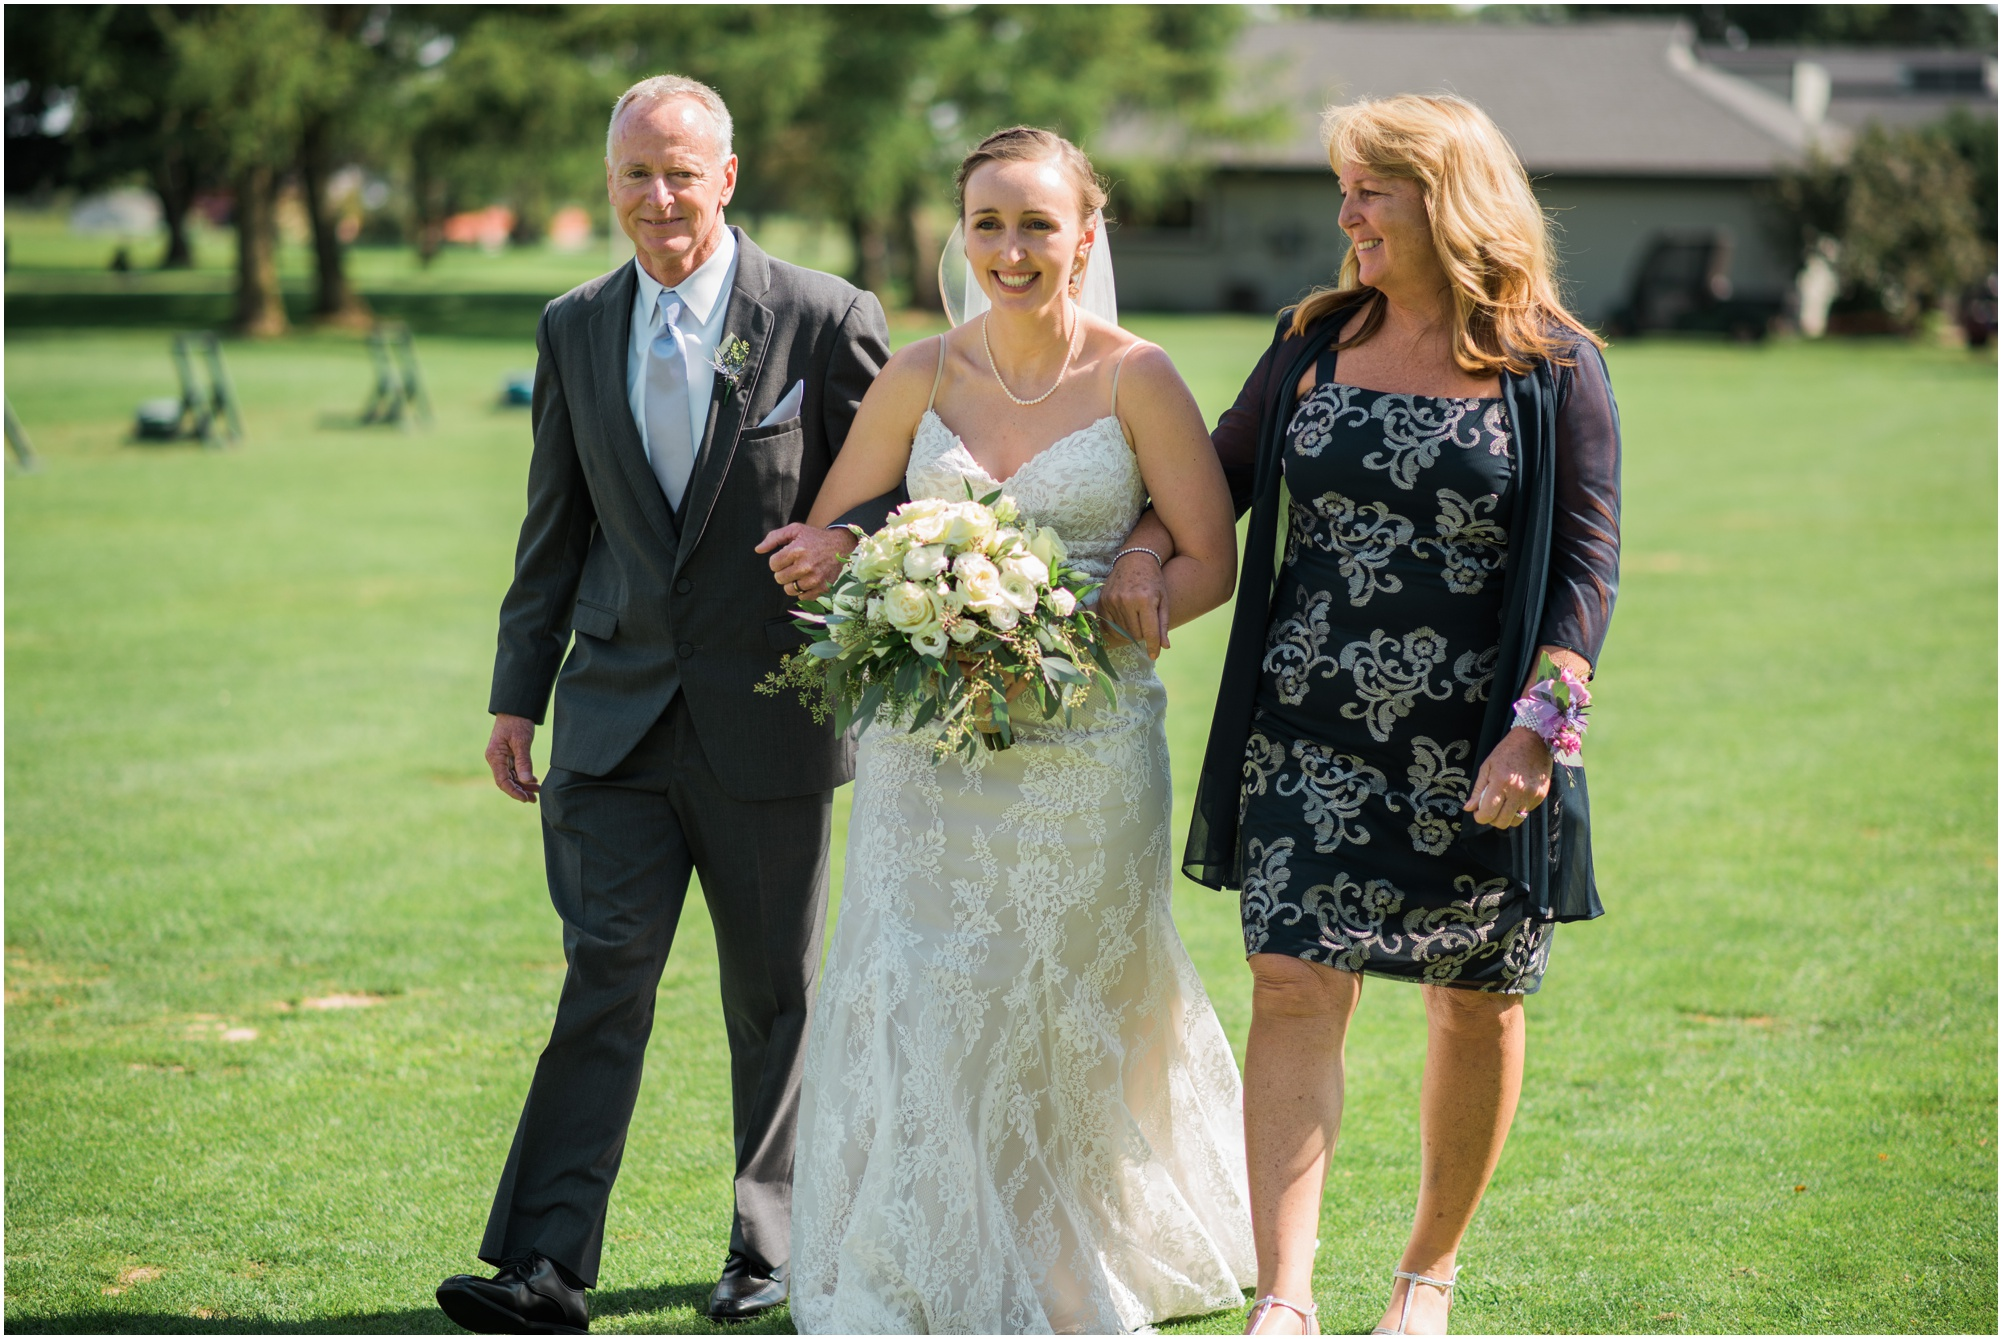 Wisconsin-Wedding-Photographer-Reedsburg-Country-Club-Kaela-and Matt-Wedding-420.jpg